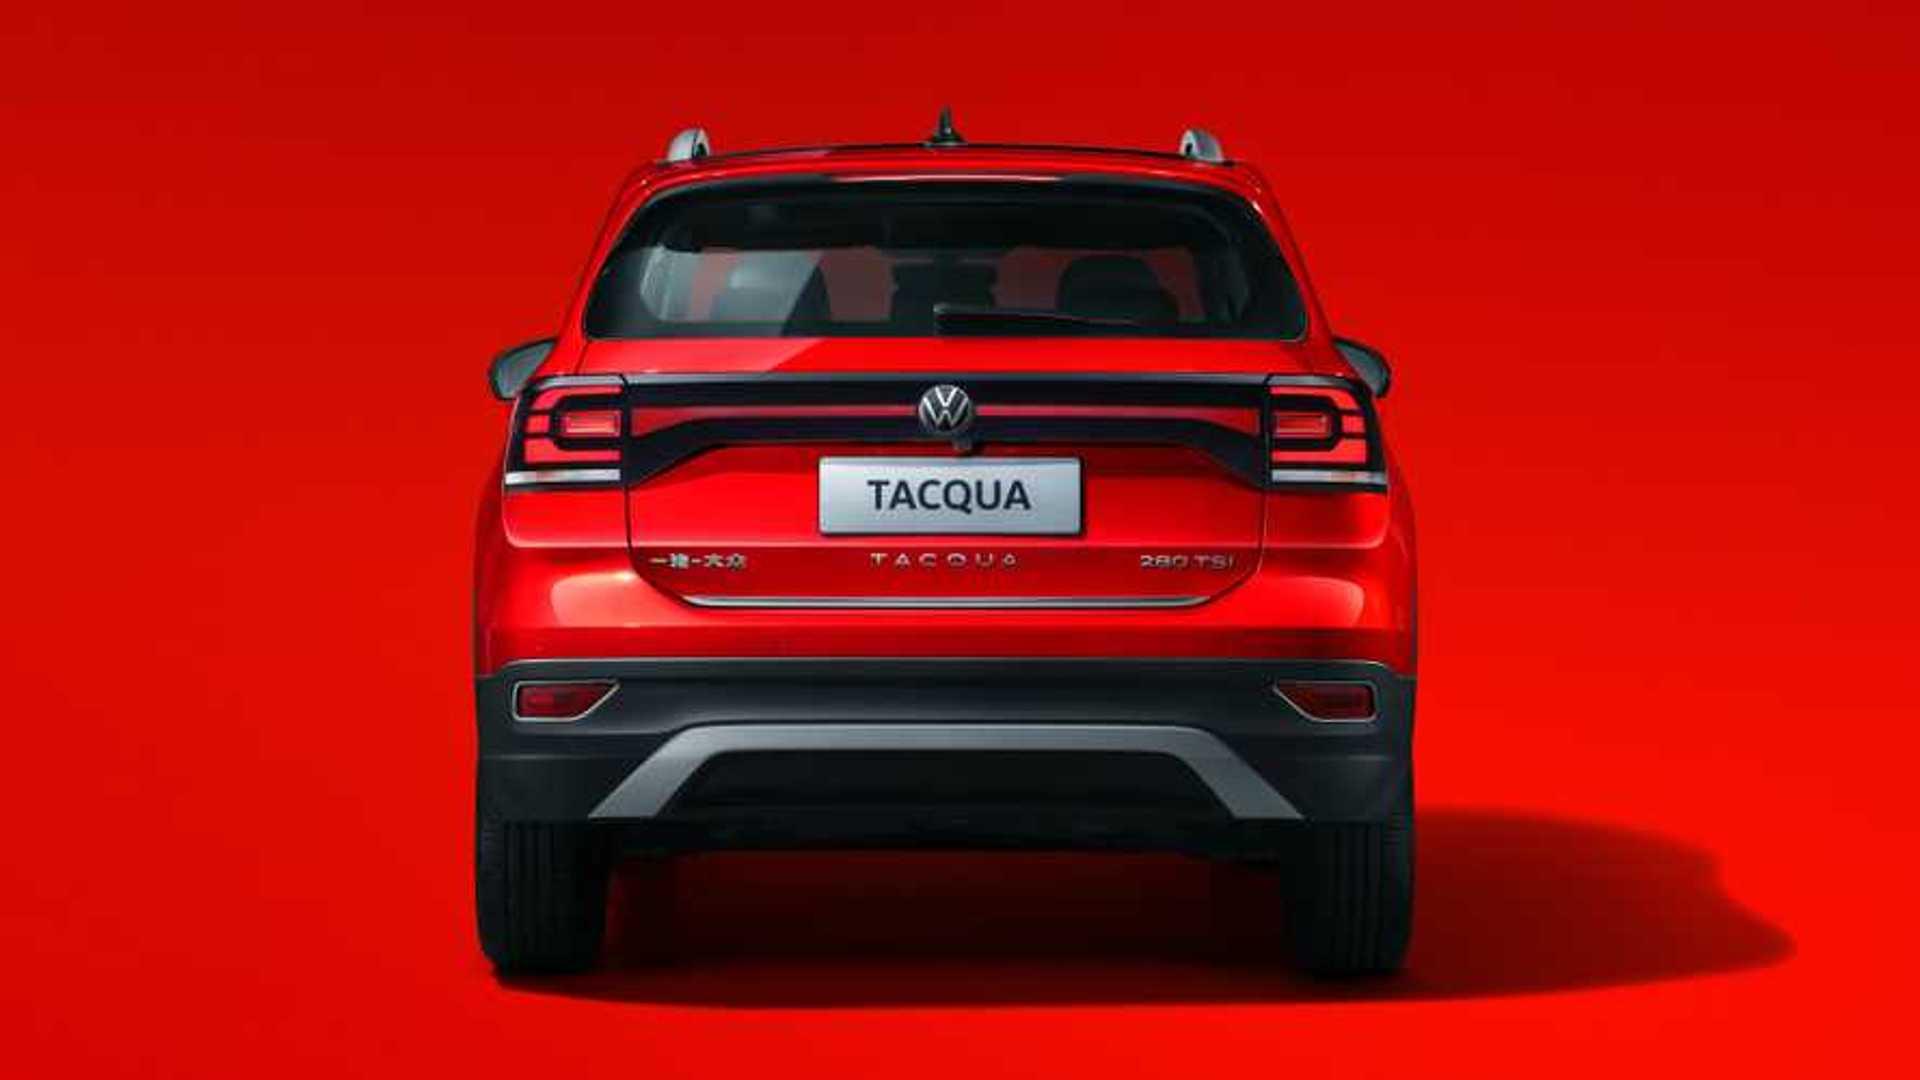 Volkswagen Tacqua - China